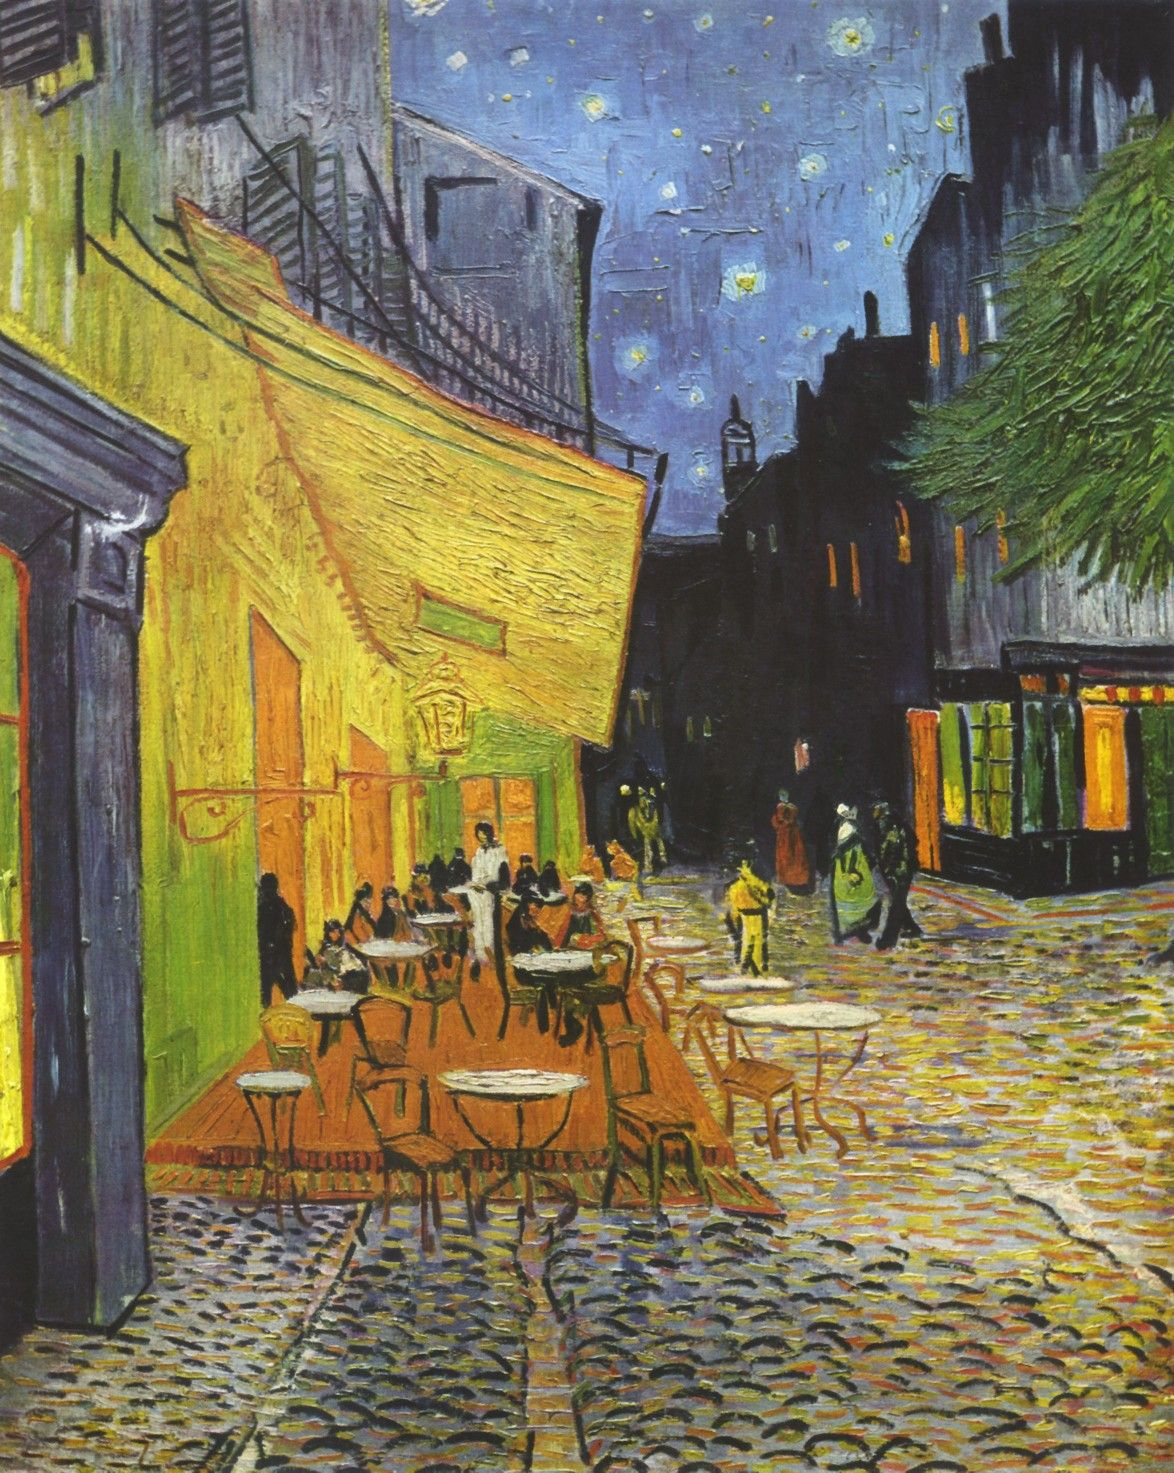 Terraza De Cafe Por La Noche In 2020 Vincent Van Gogh Art Van Gogh Wallpaper Van Gogh Paintings